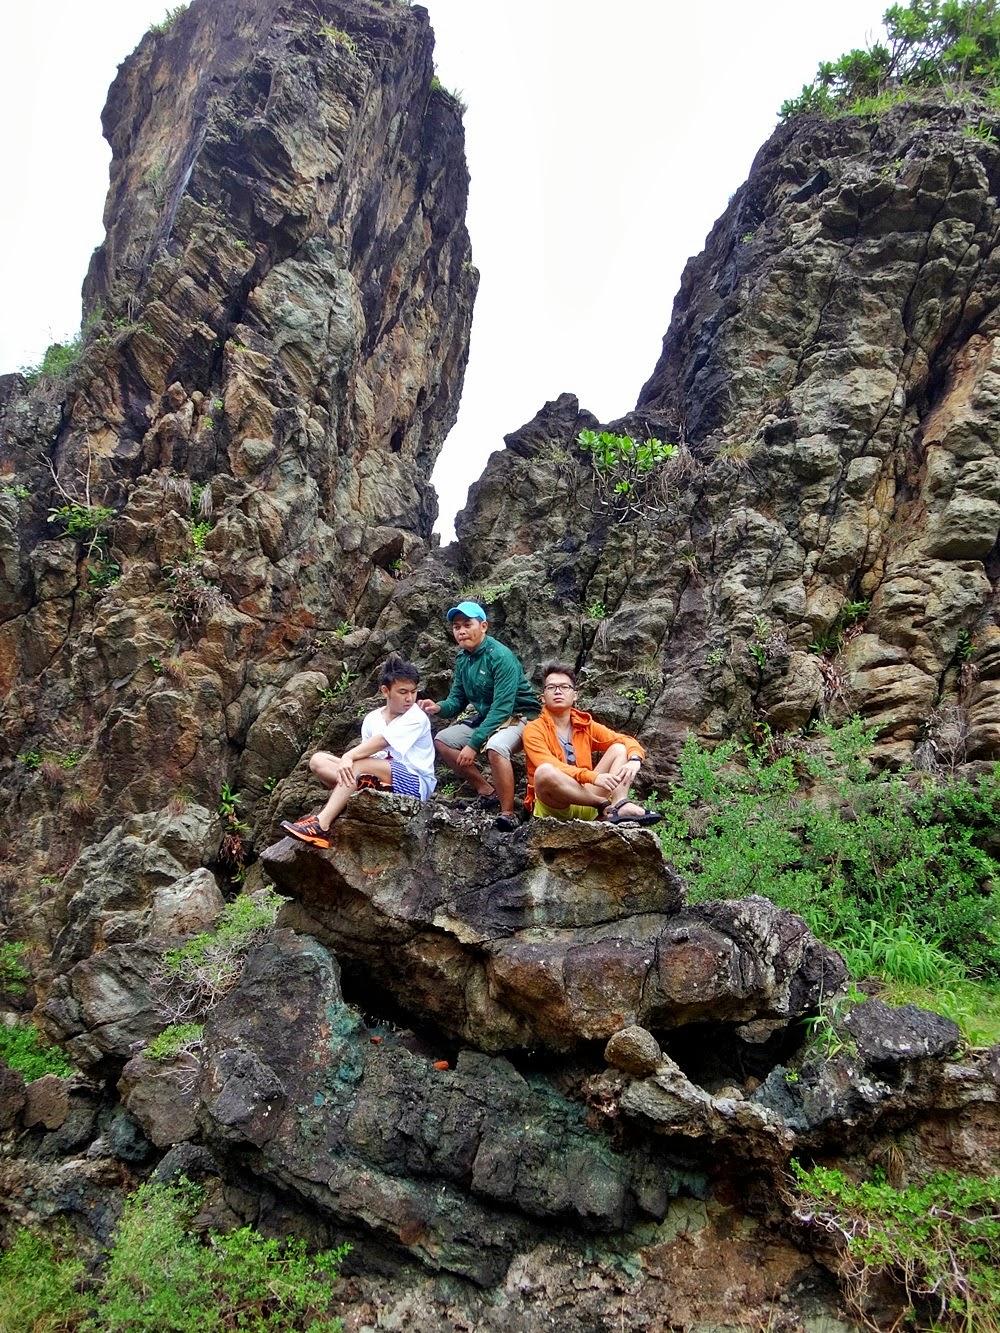 DELUXSHIONIST TRAVEL TRIP EXPLORING TANJUNG LAYAR, UJUNG KULON